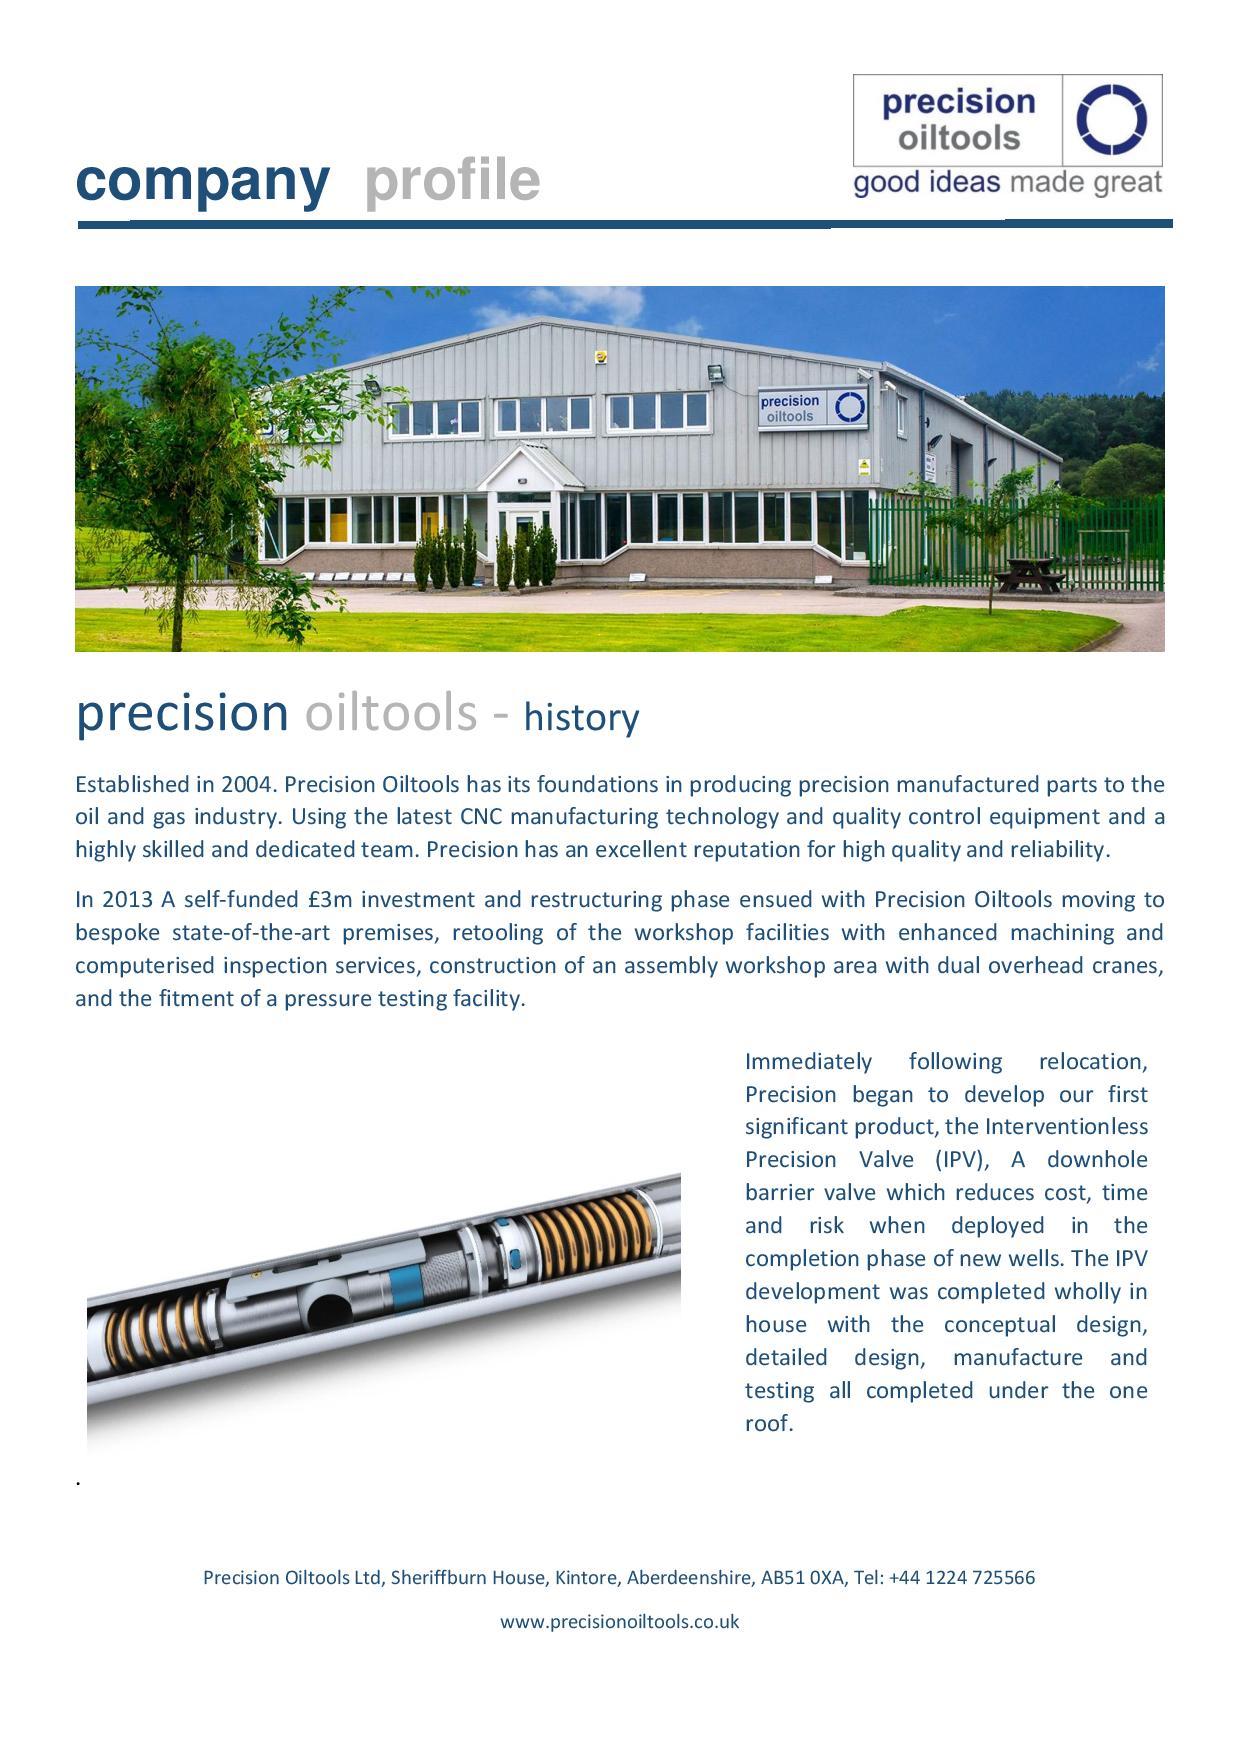 history - precision oiltools